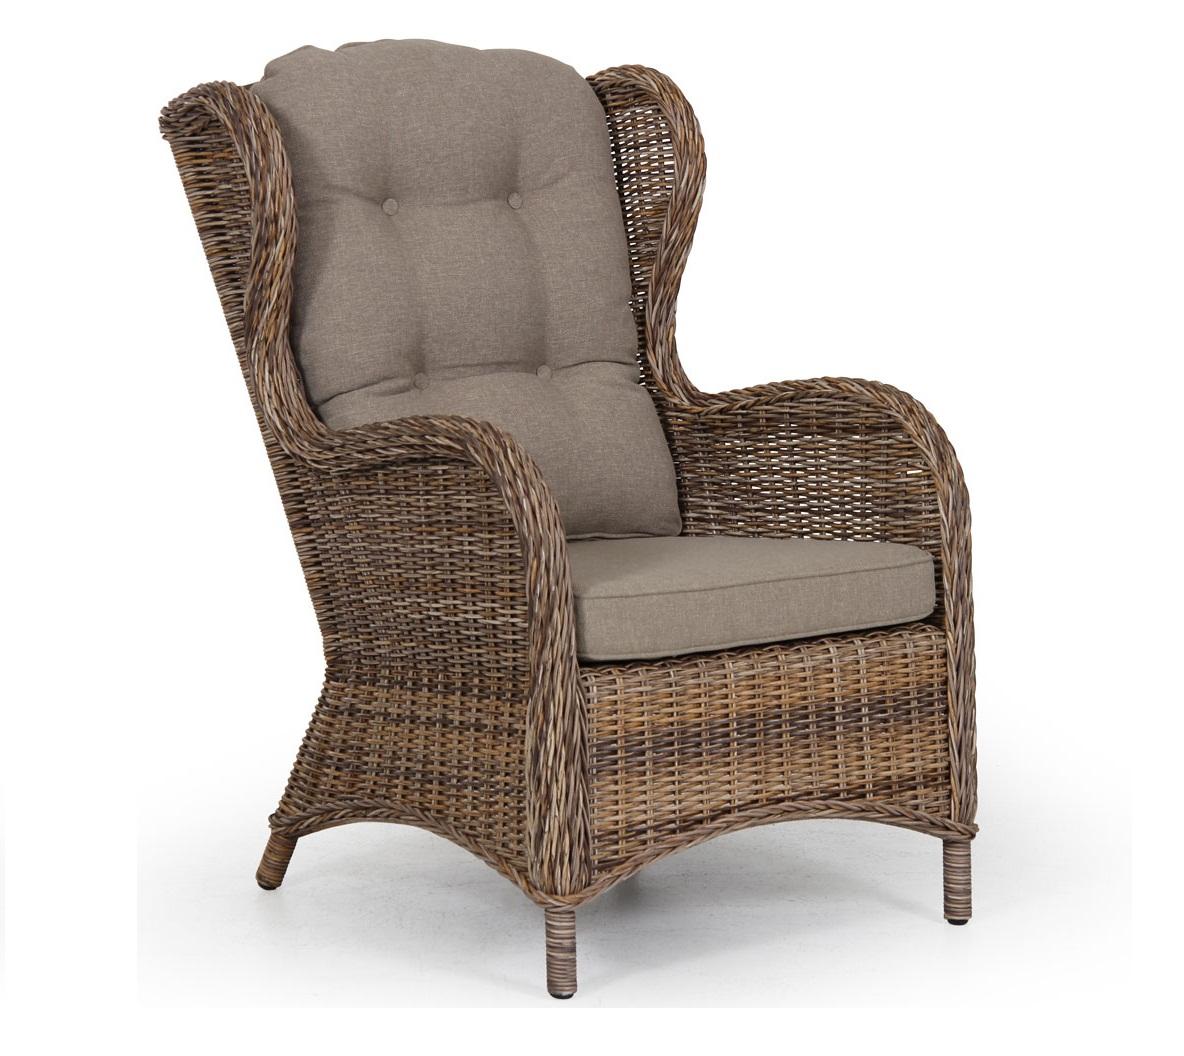 Плетеное кресло Evita brown Brafab